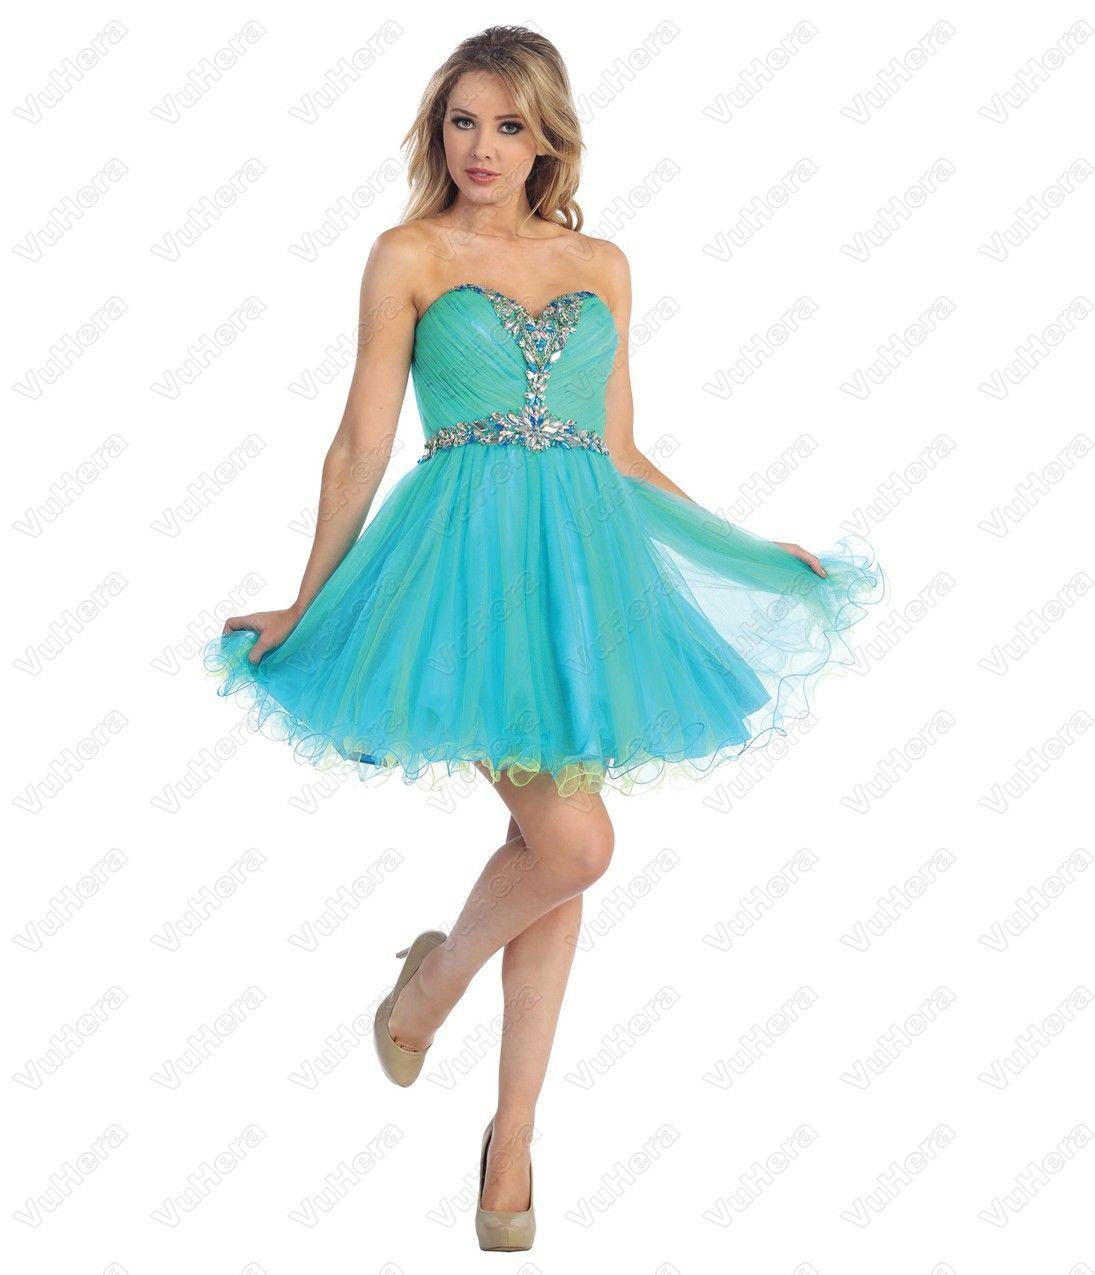 Neon Green Short Prom Dresses | Chiffon Strapless Blue Short Prom ...